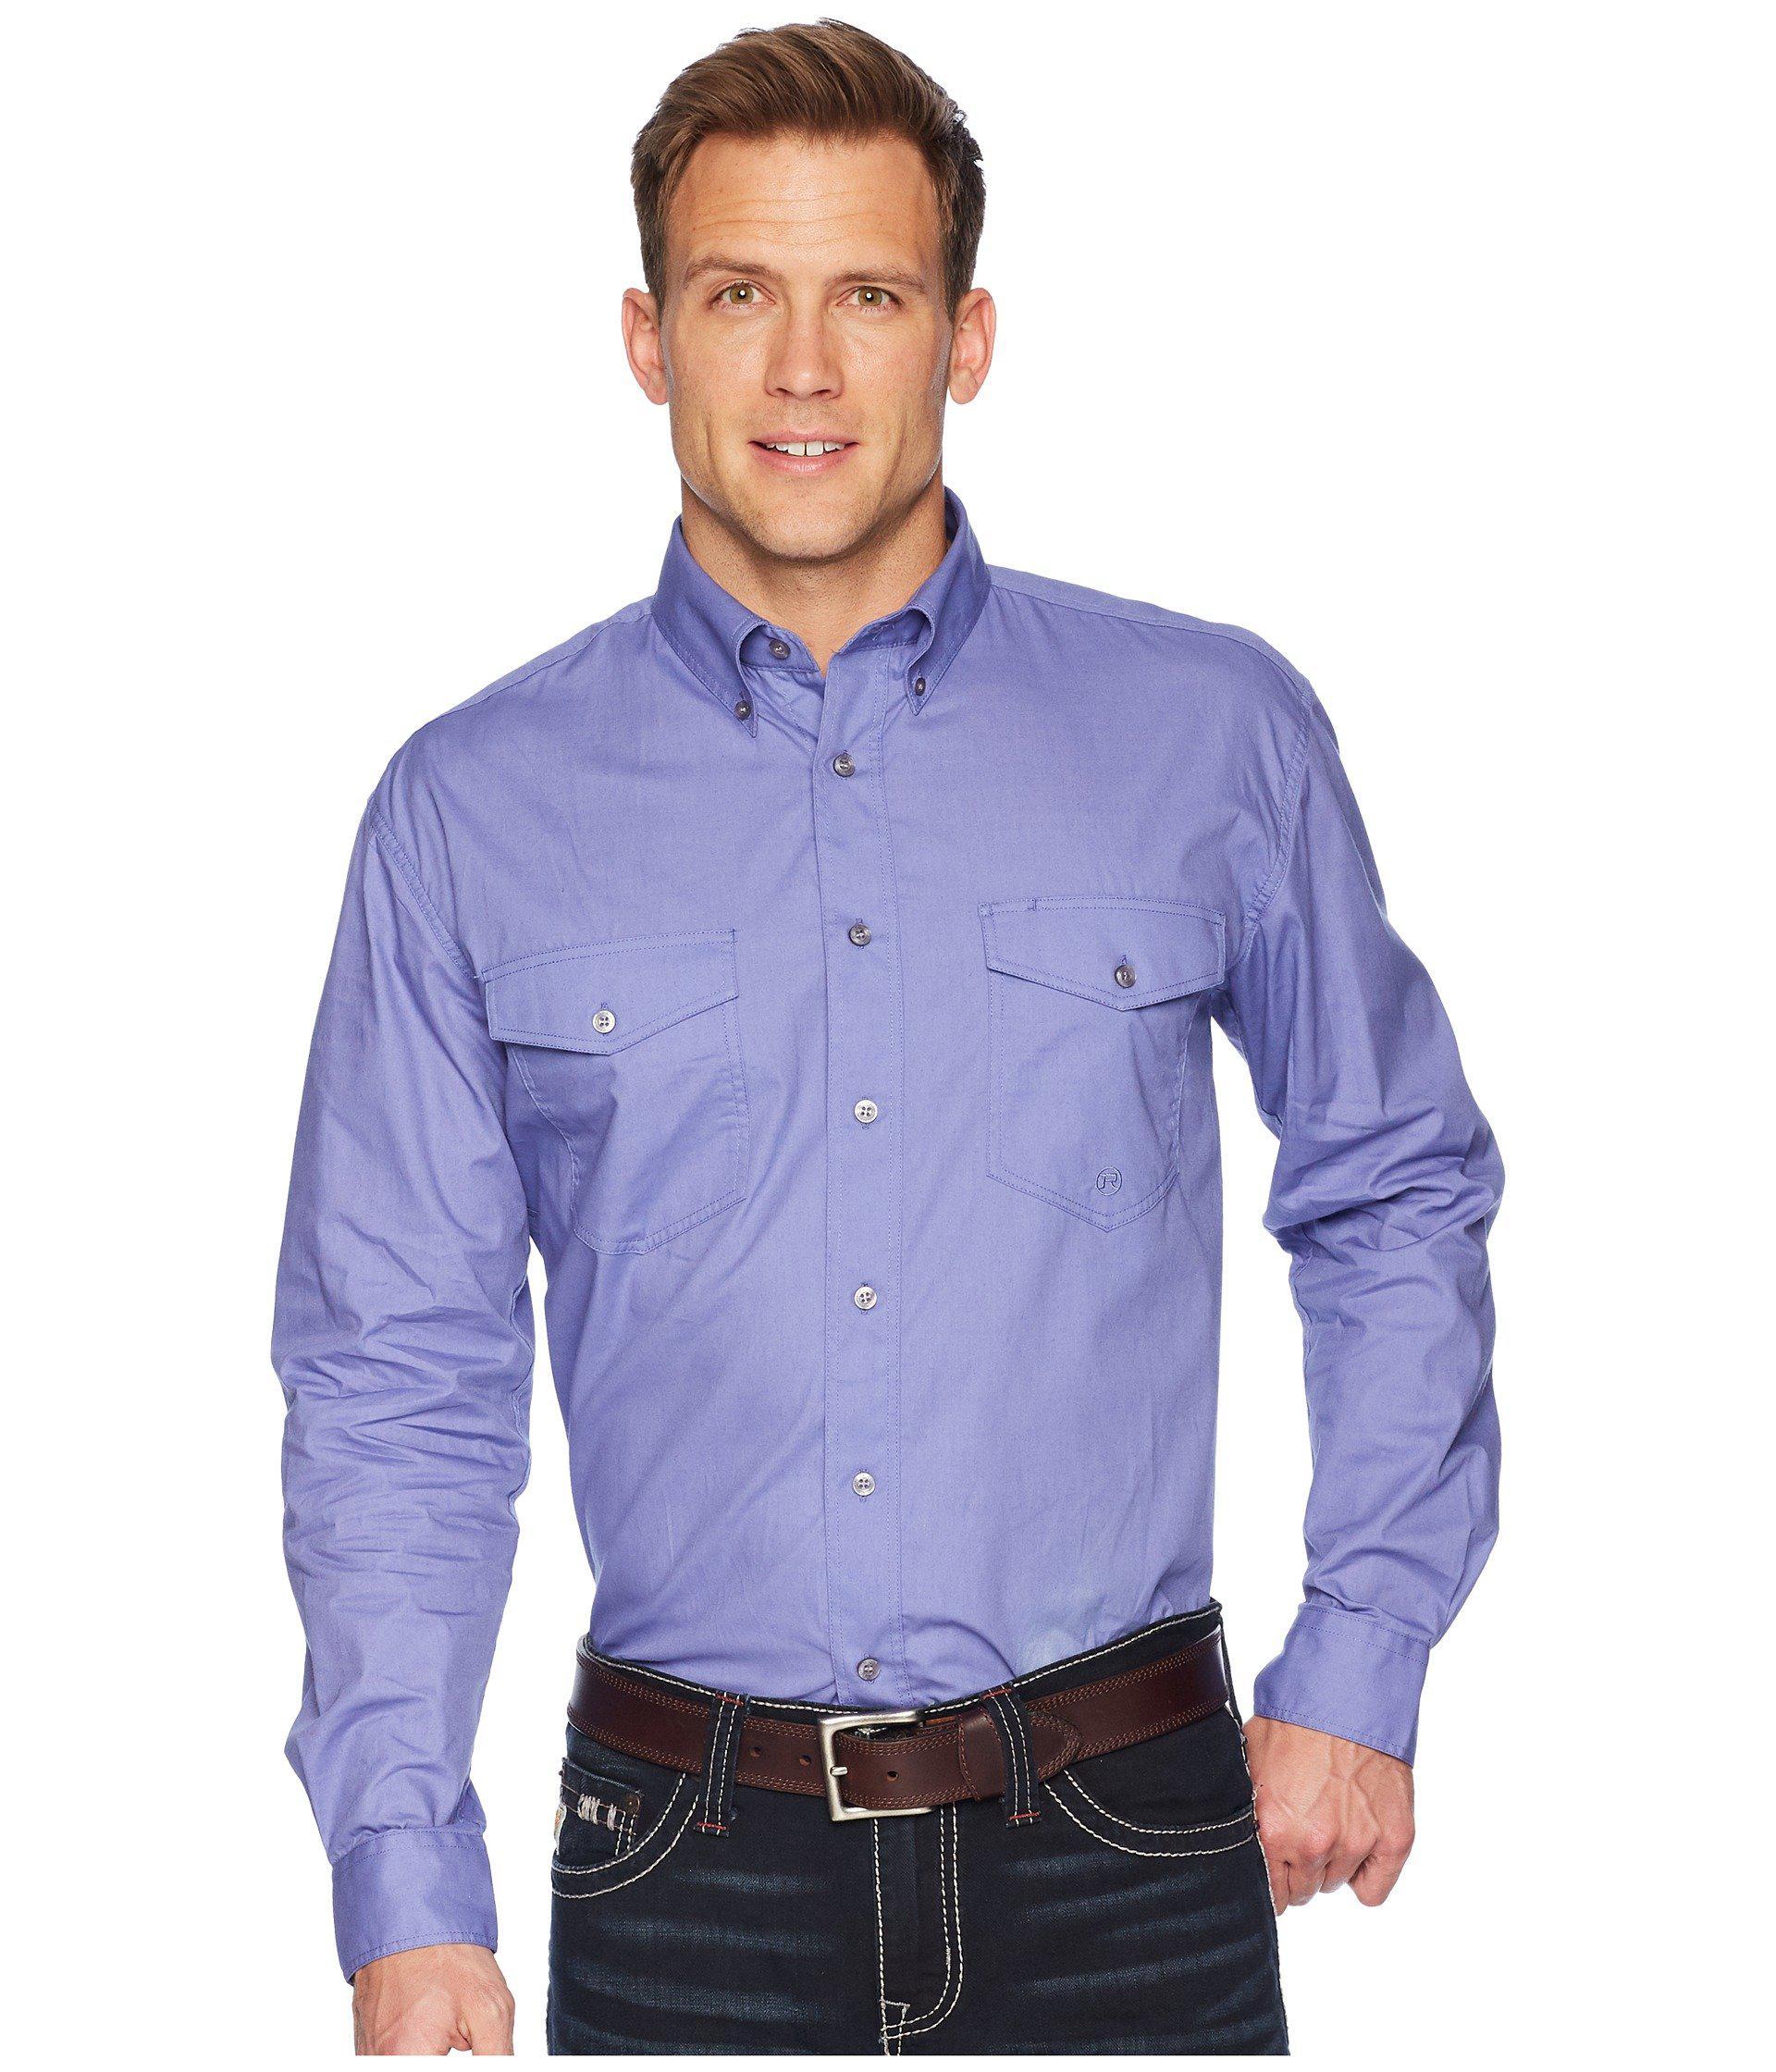 86fdb878cd29 Lyst - Roper 1528 Solid Poplin in Purple for Men - Save 44%